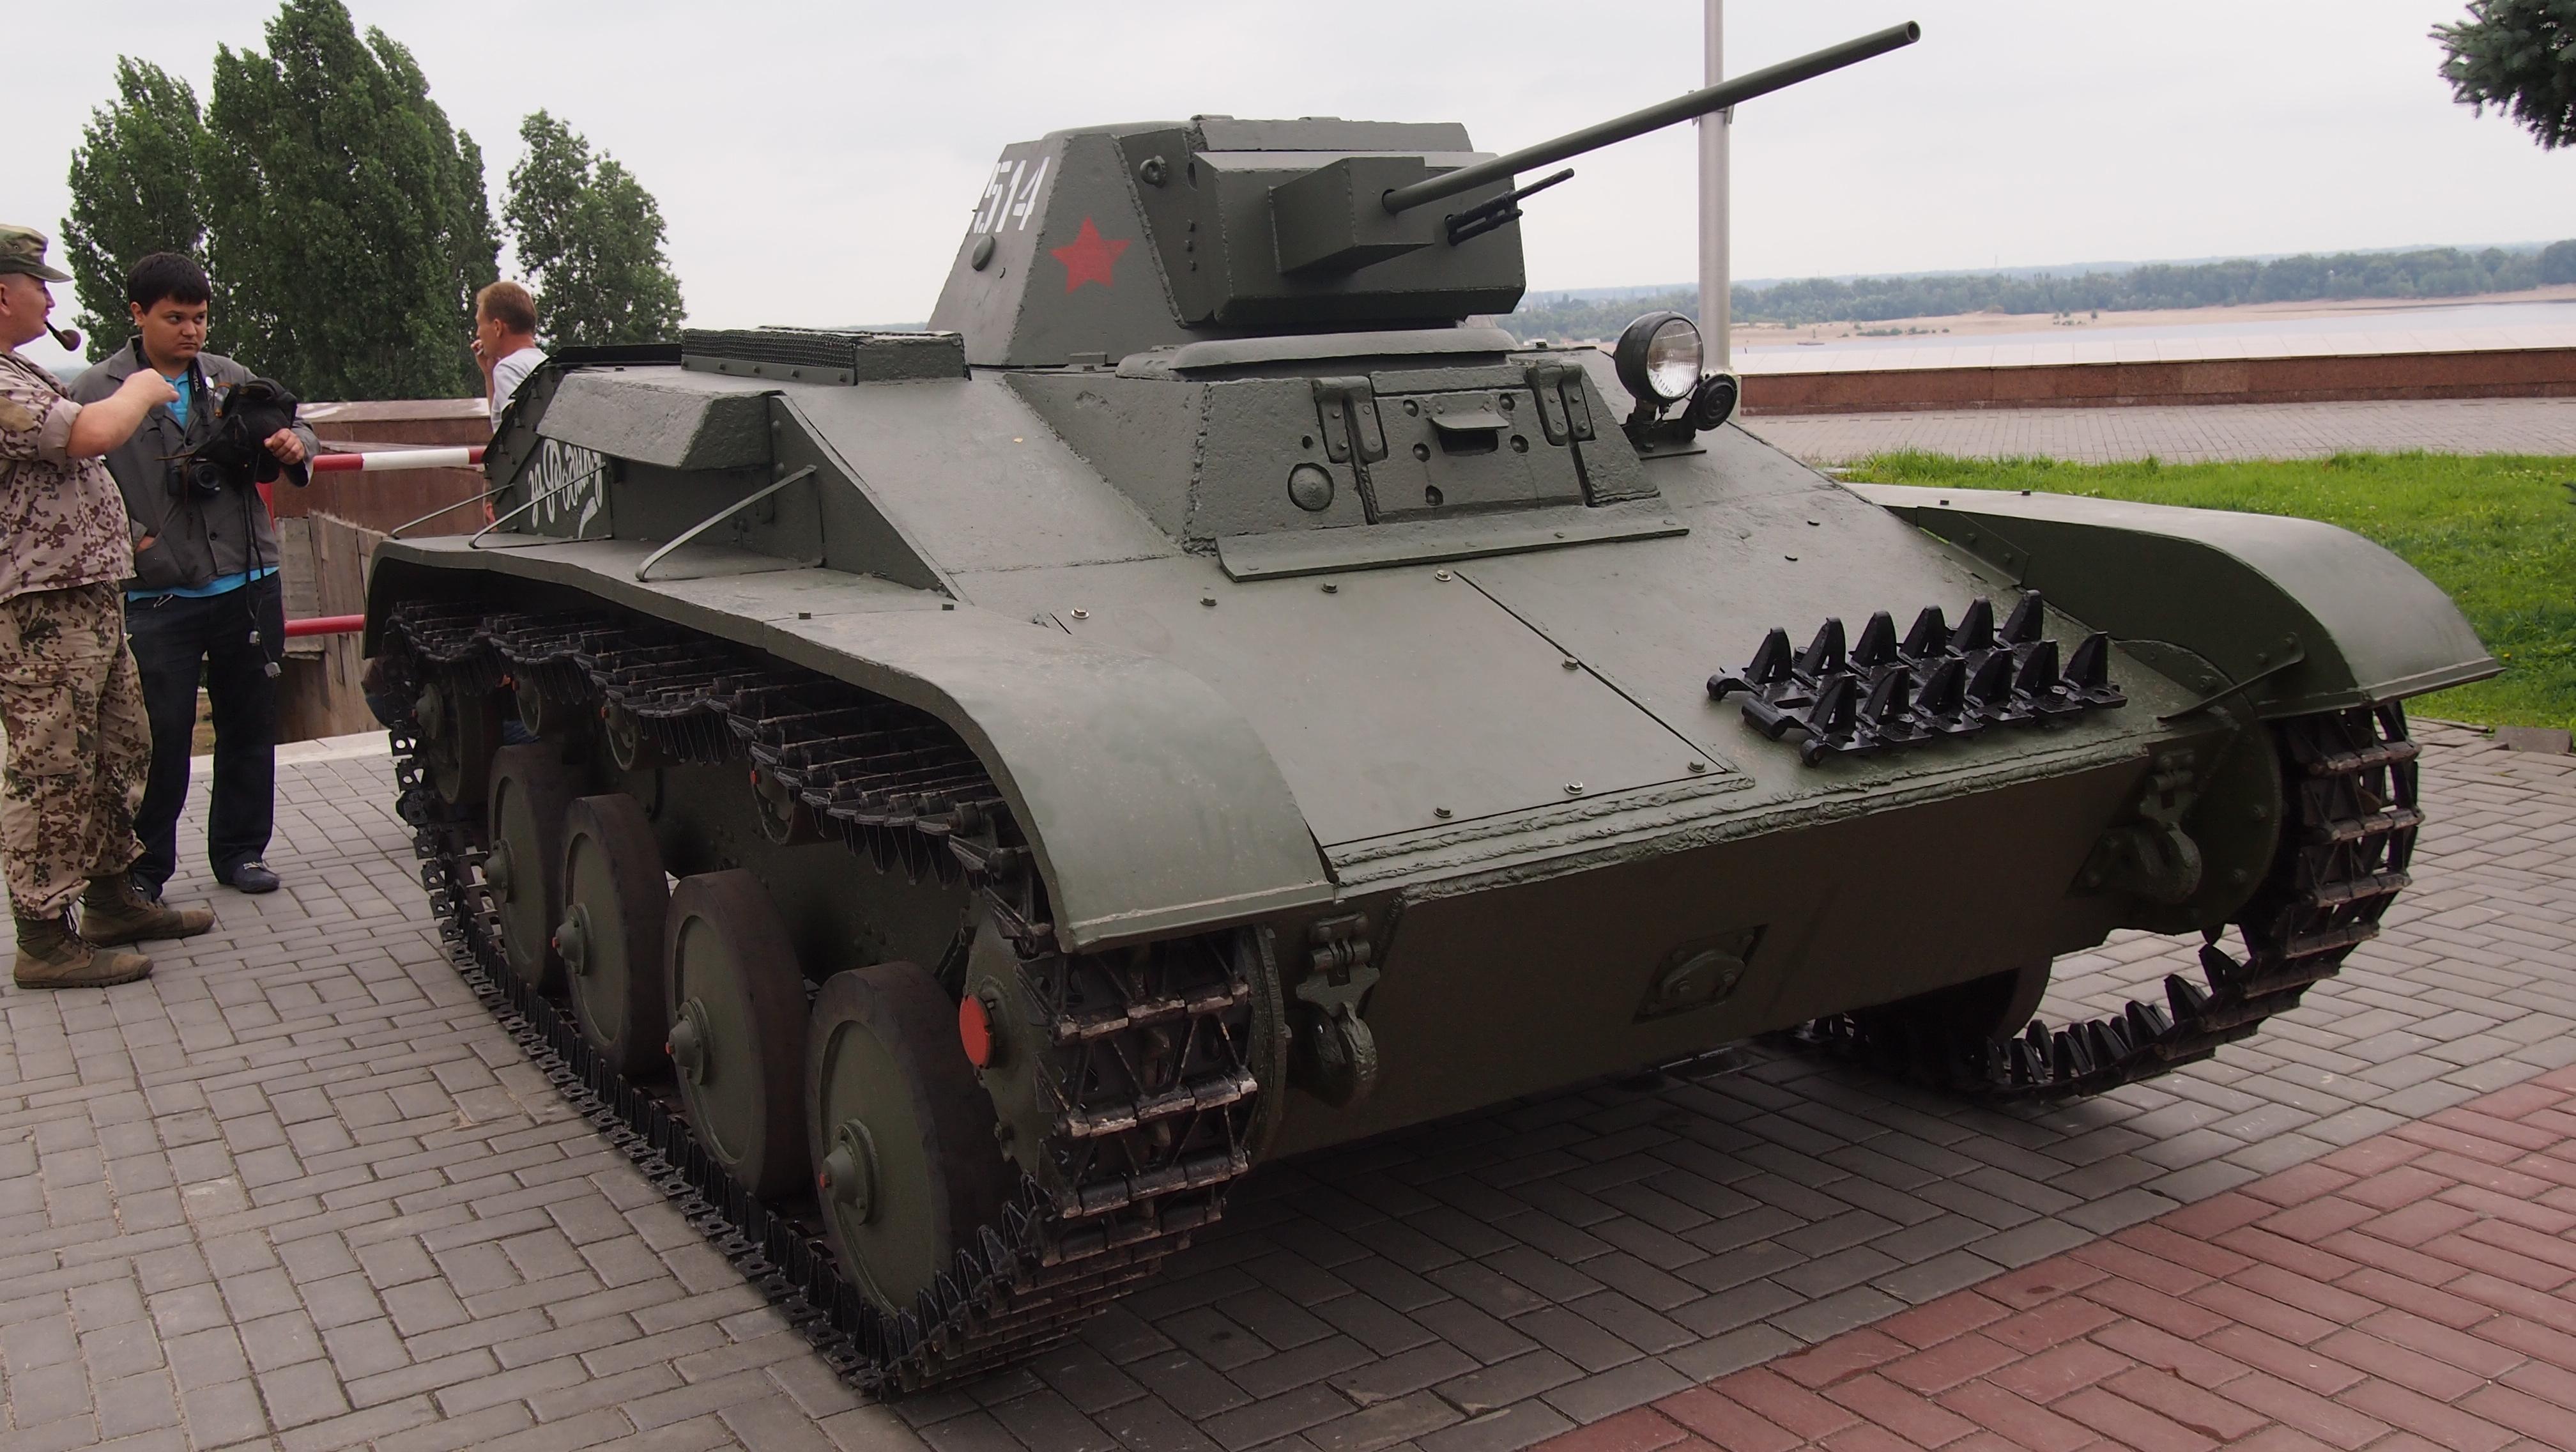 The restored tank